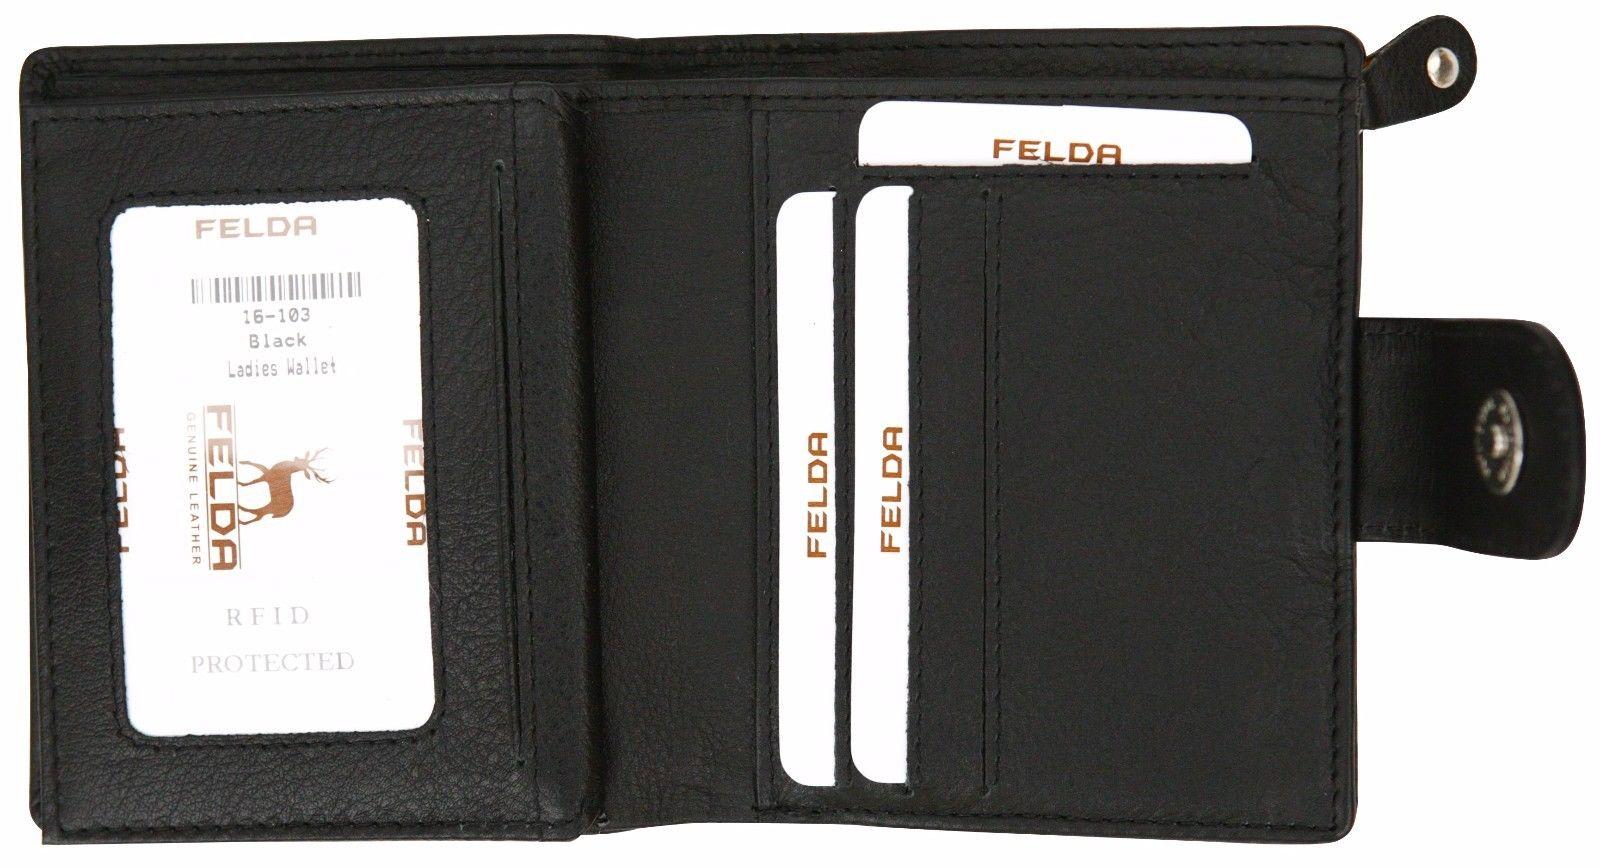 Felda-RFID-onorevoli-MEDAGLIA-amp-Card-Purse-Wallet-Genuine-Leather-Multi-SOFT-BOX-REGALO miniatura 14